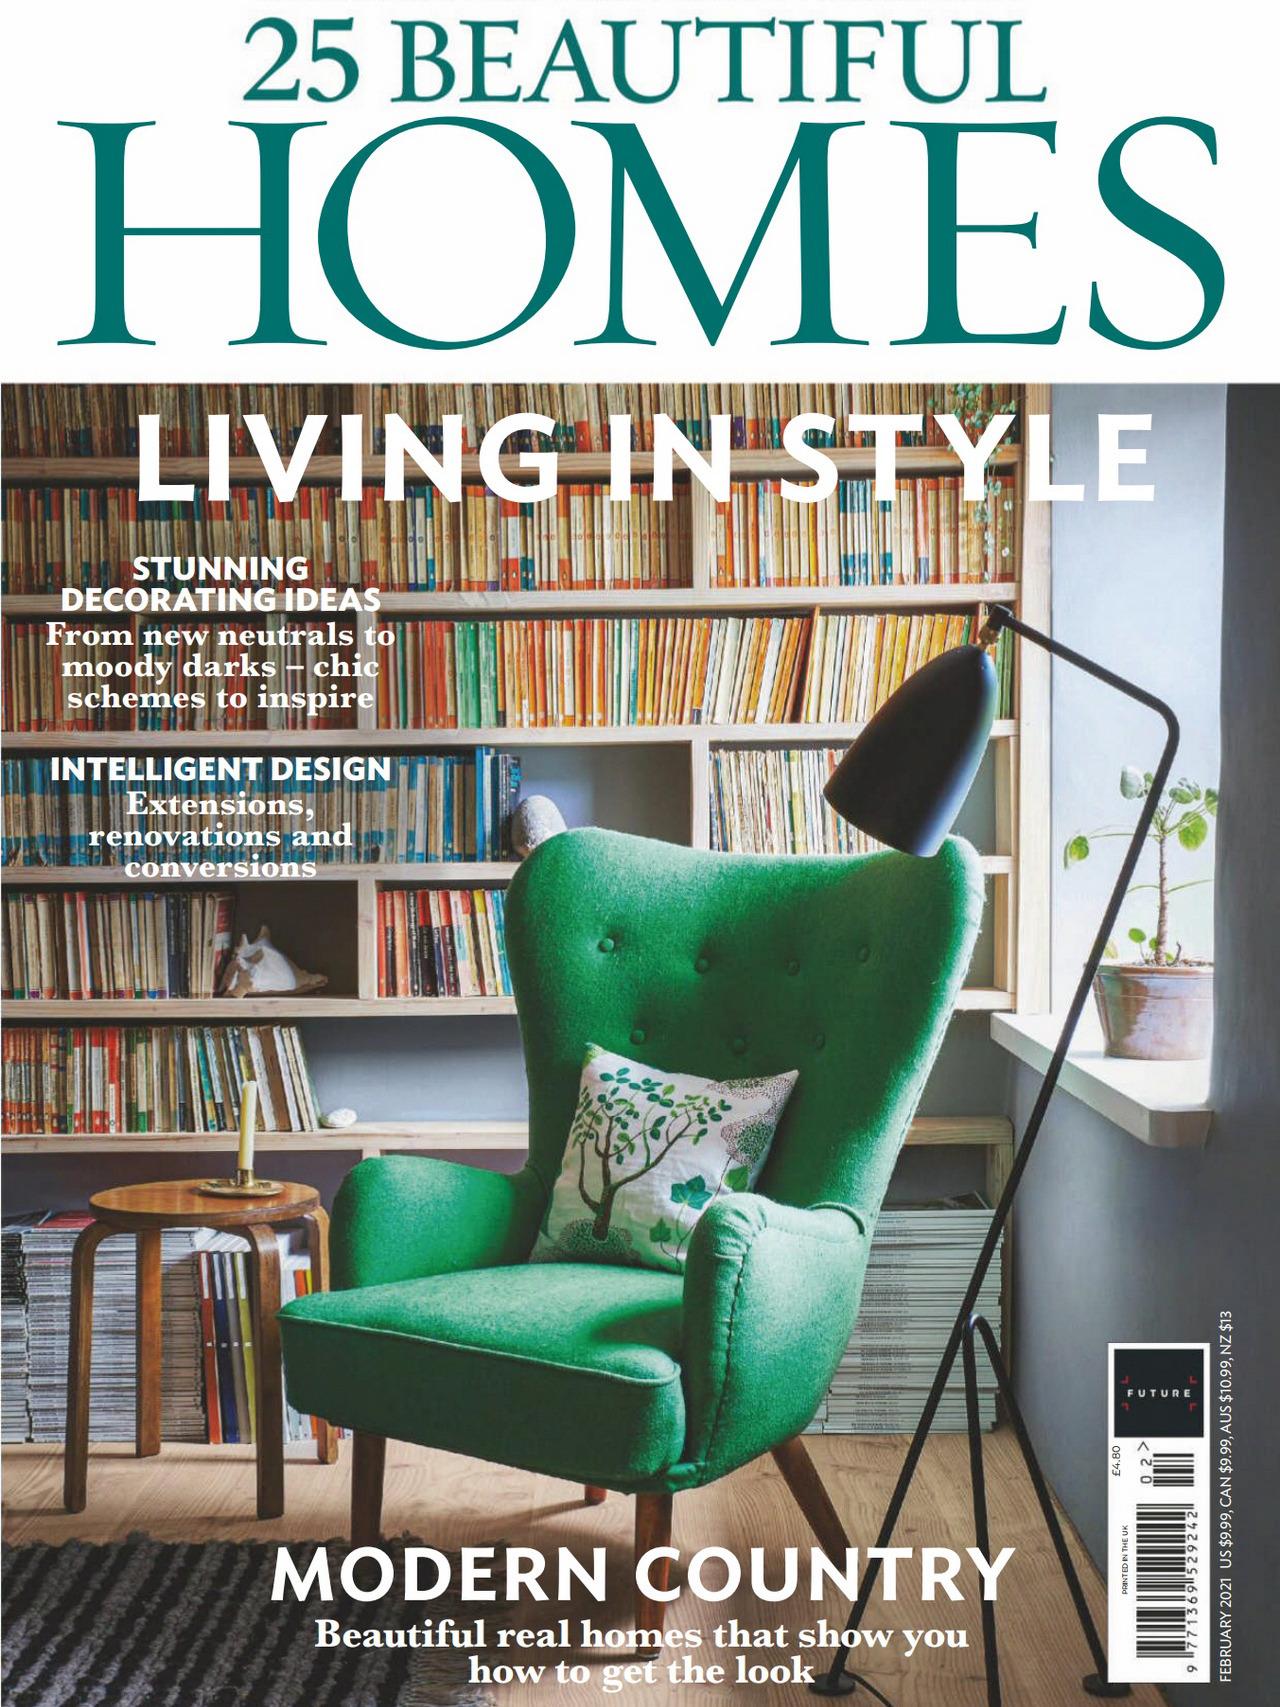 《25 Beautiful Homes》英国版时尚家居设计杂志2021年02号